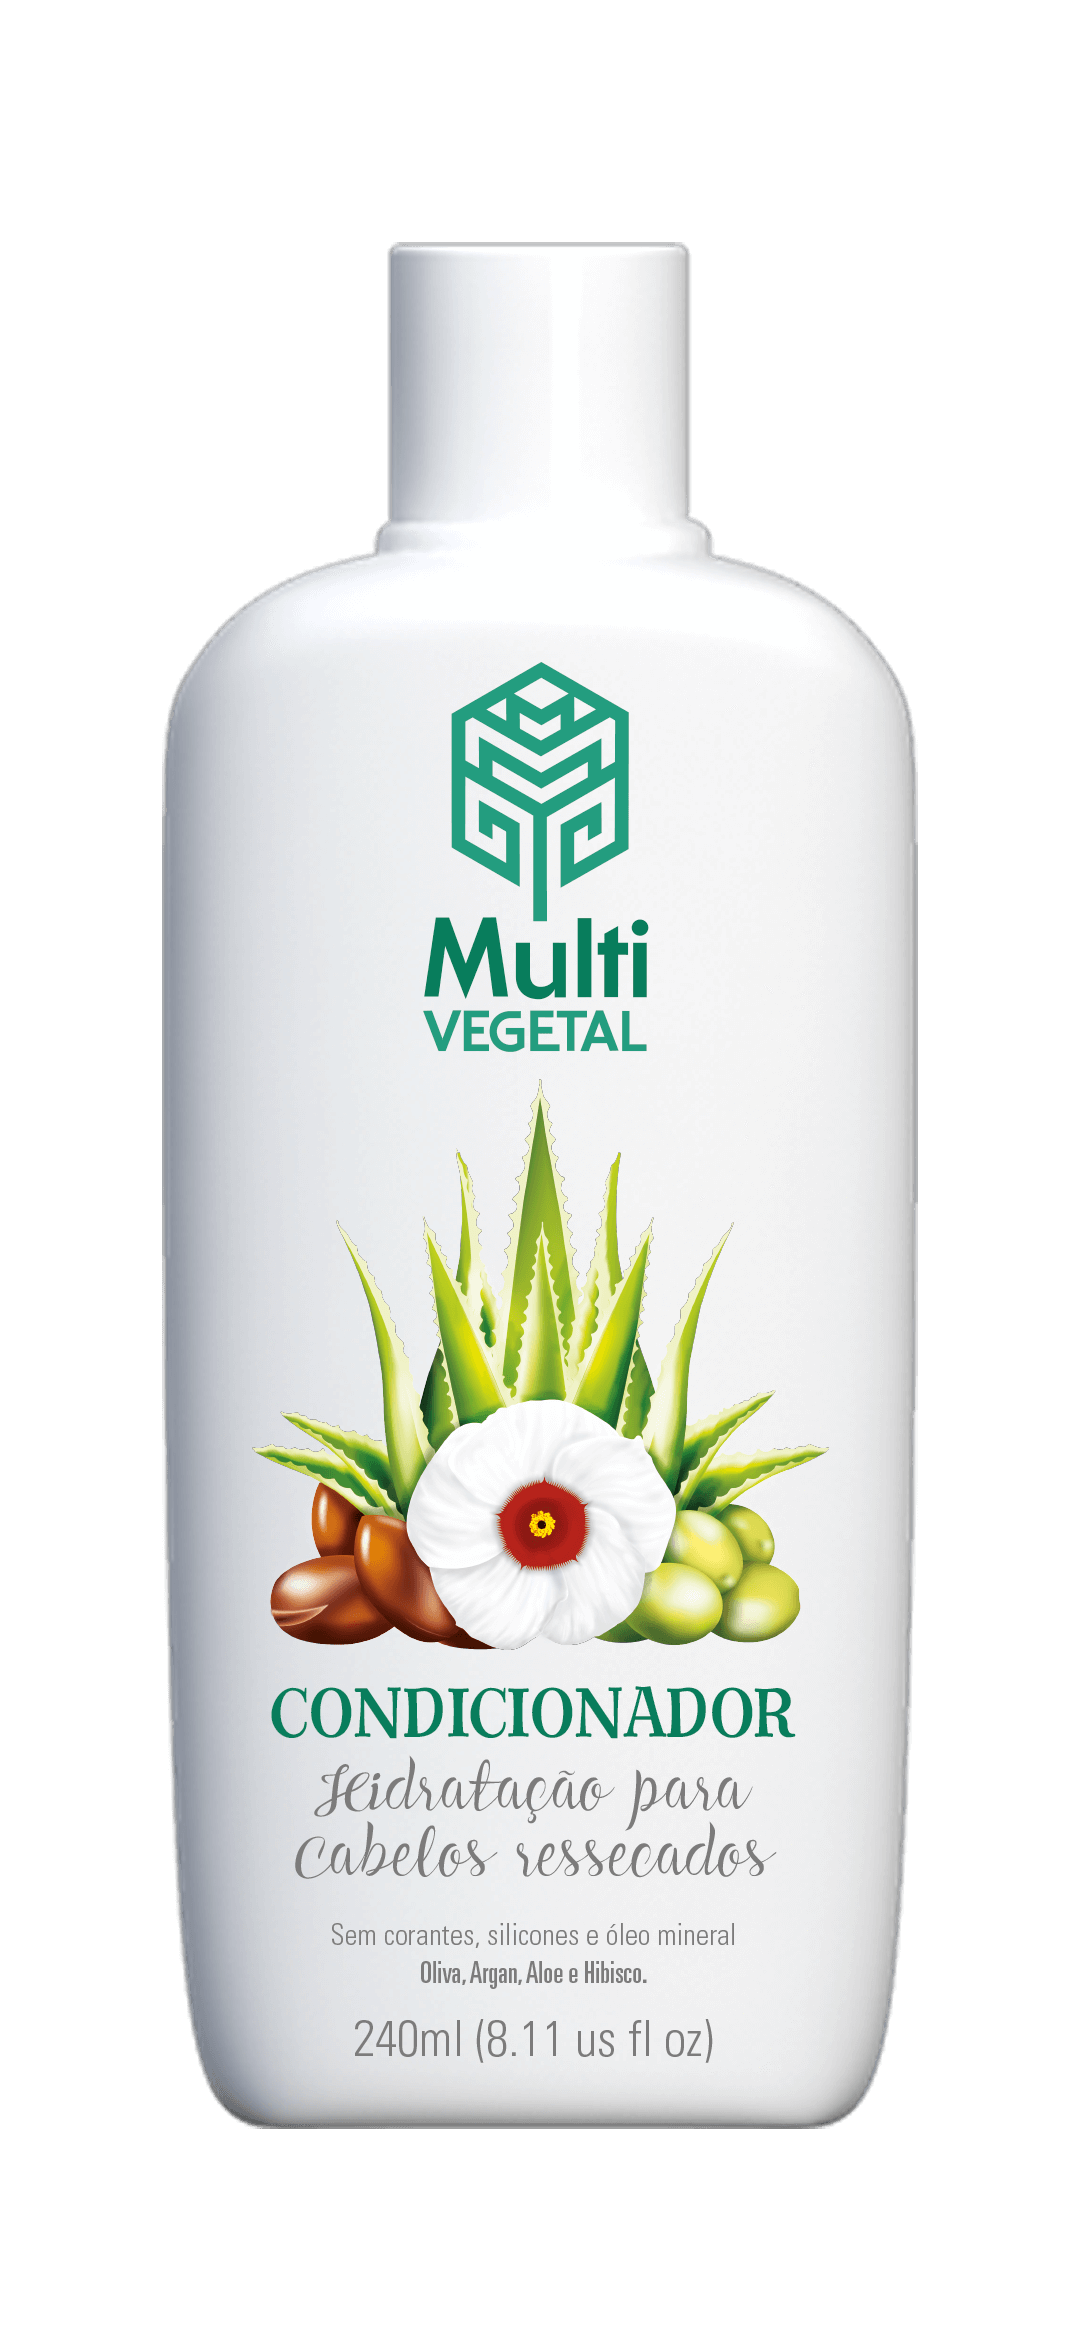 Condicionador de Oliva com Argan, Aloe e Hibisco 240ml